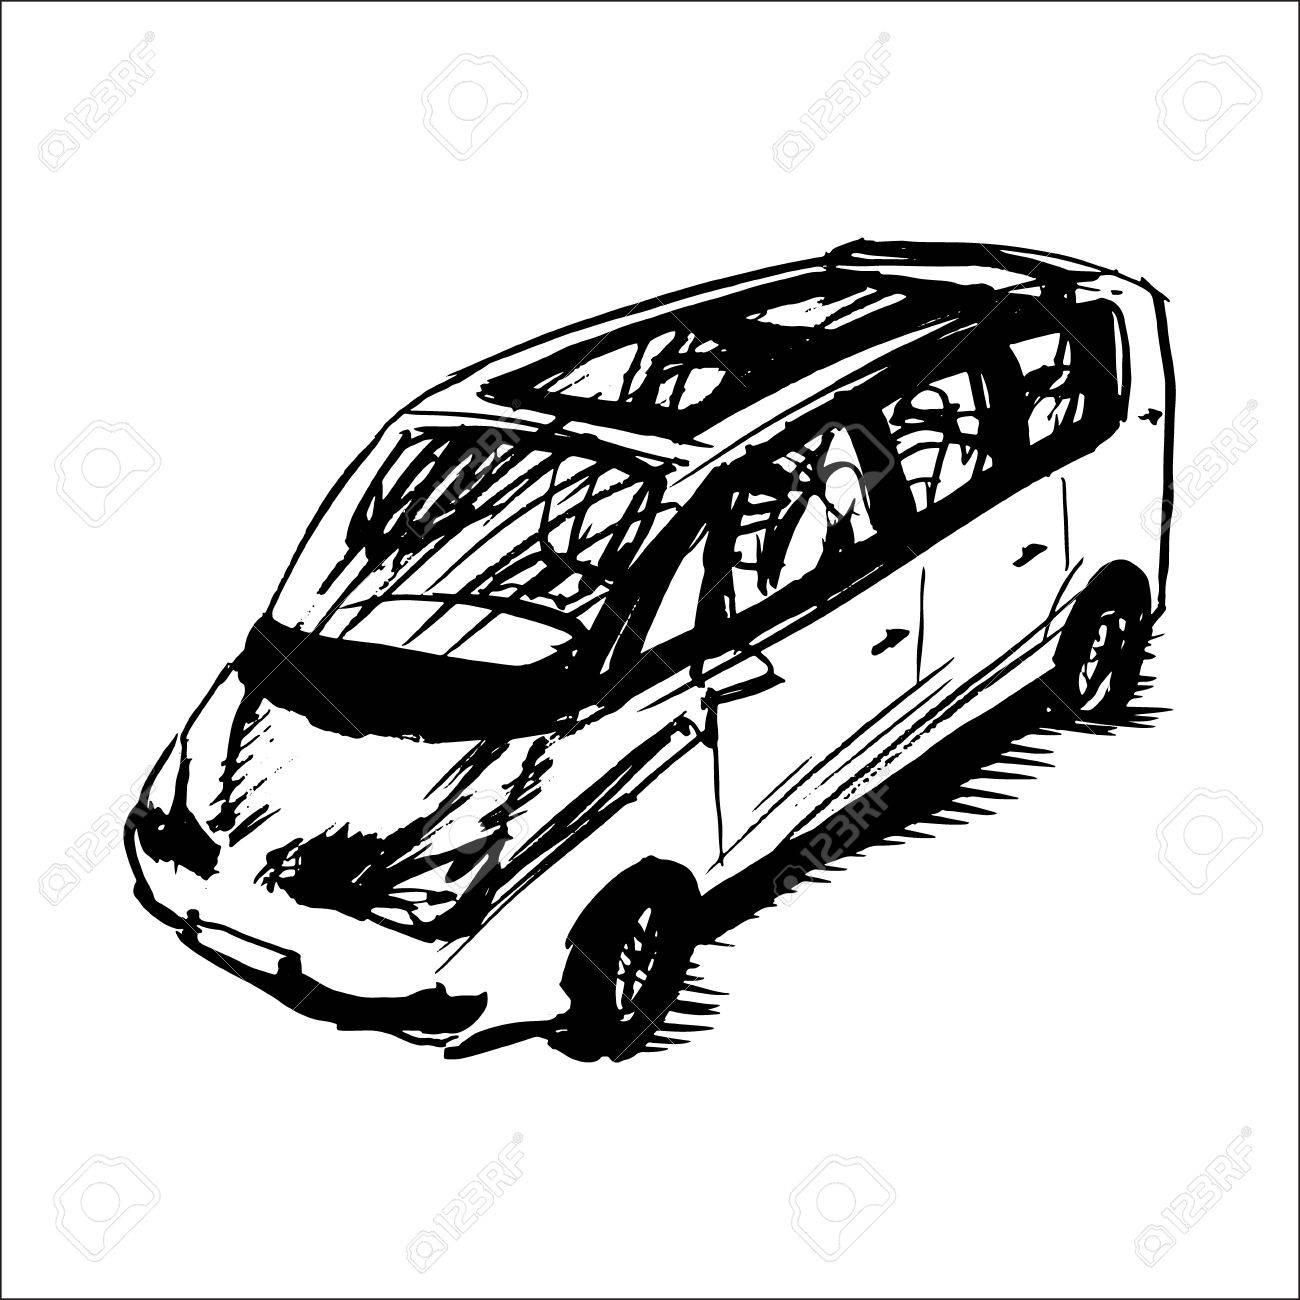 1300x1300 Car, Minivan, Vector Sketch Royalty Free Cliparts, Vectors,